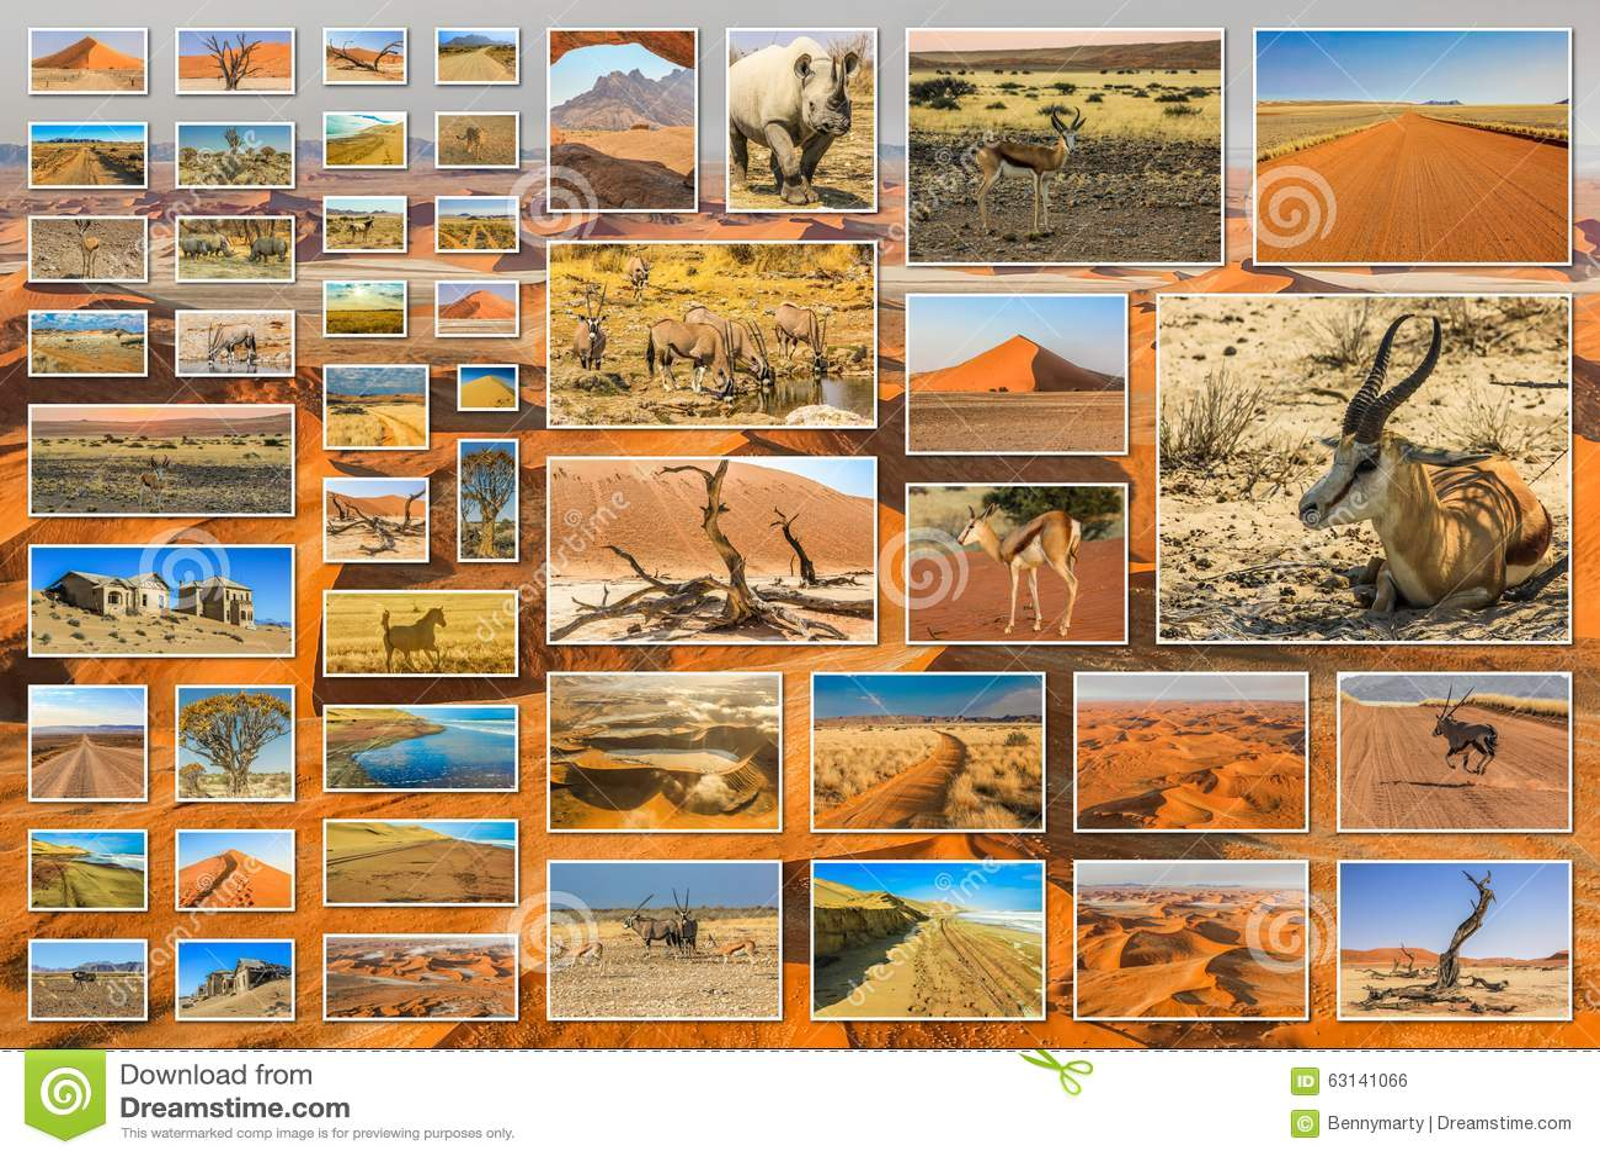 Skeleton Coast Namibia >> Namibia desert collage stock photo. Image of quiver ...